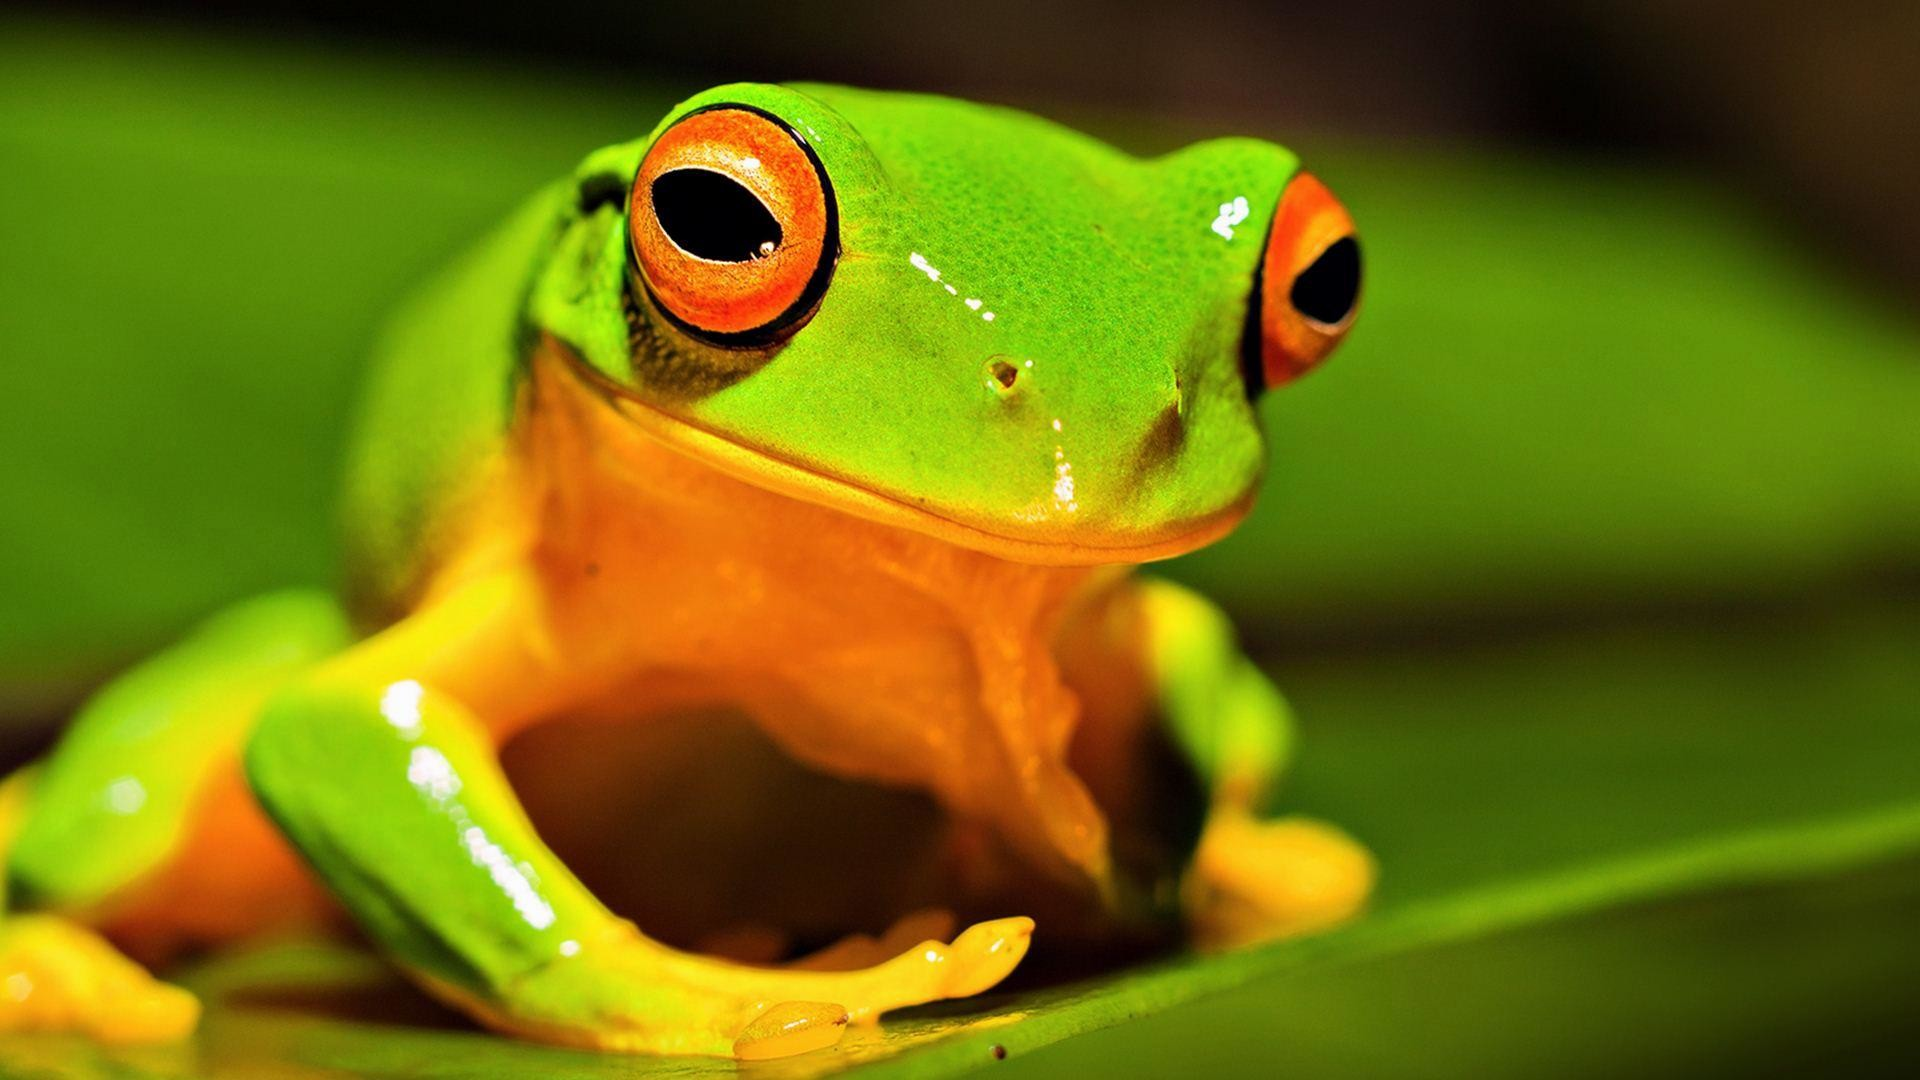 Nature-Animals-Frog-Green-Wallpaper